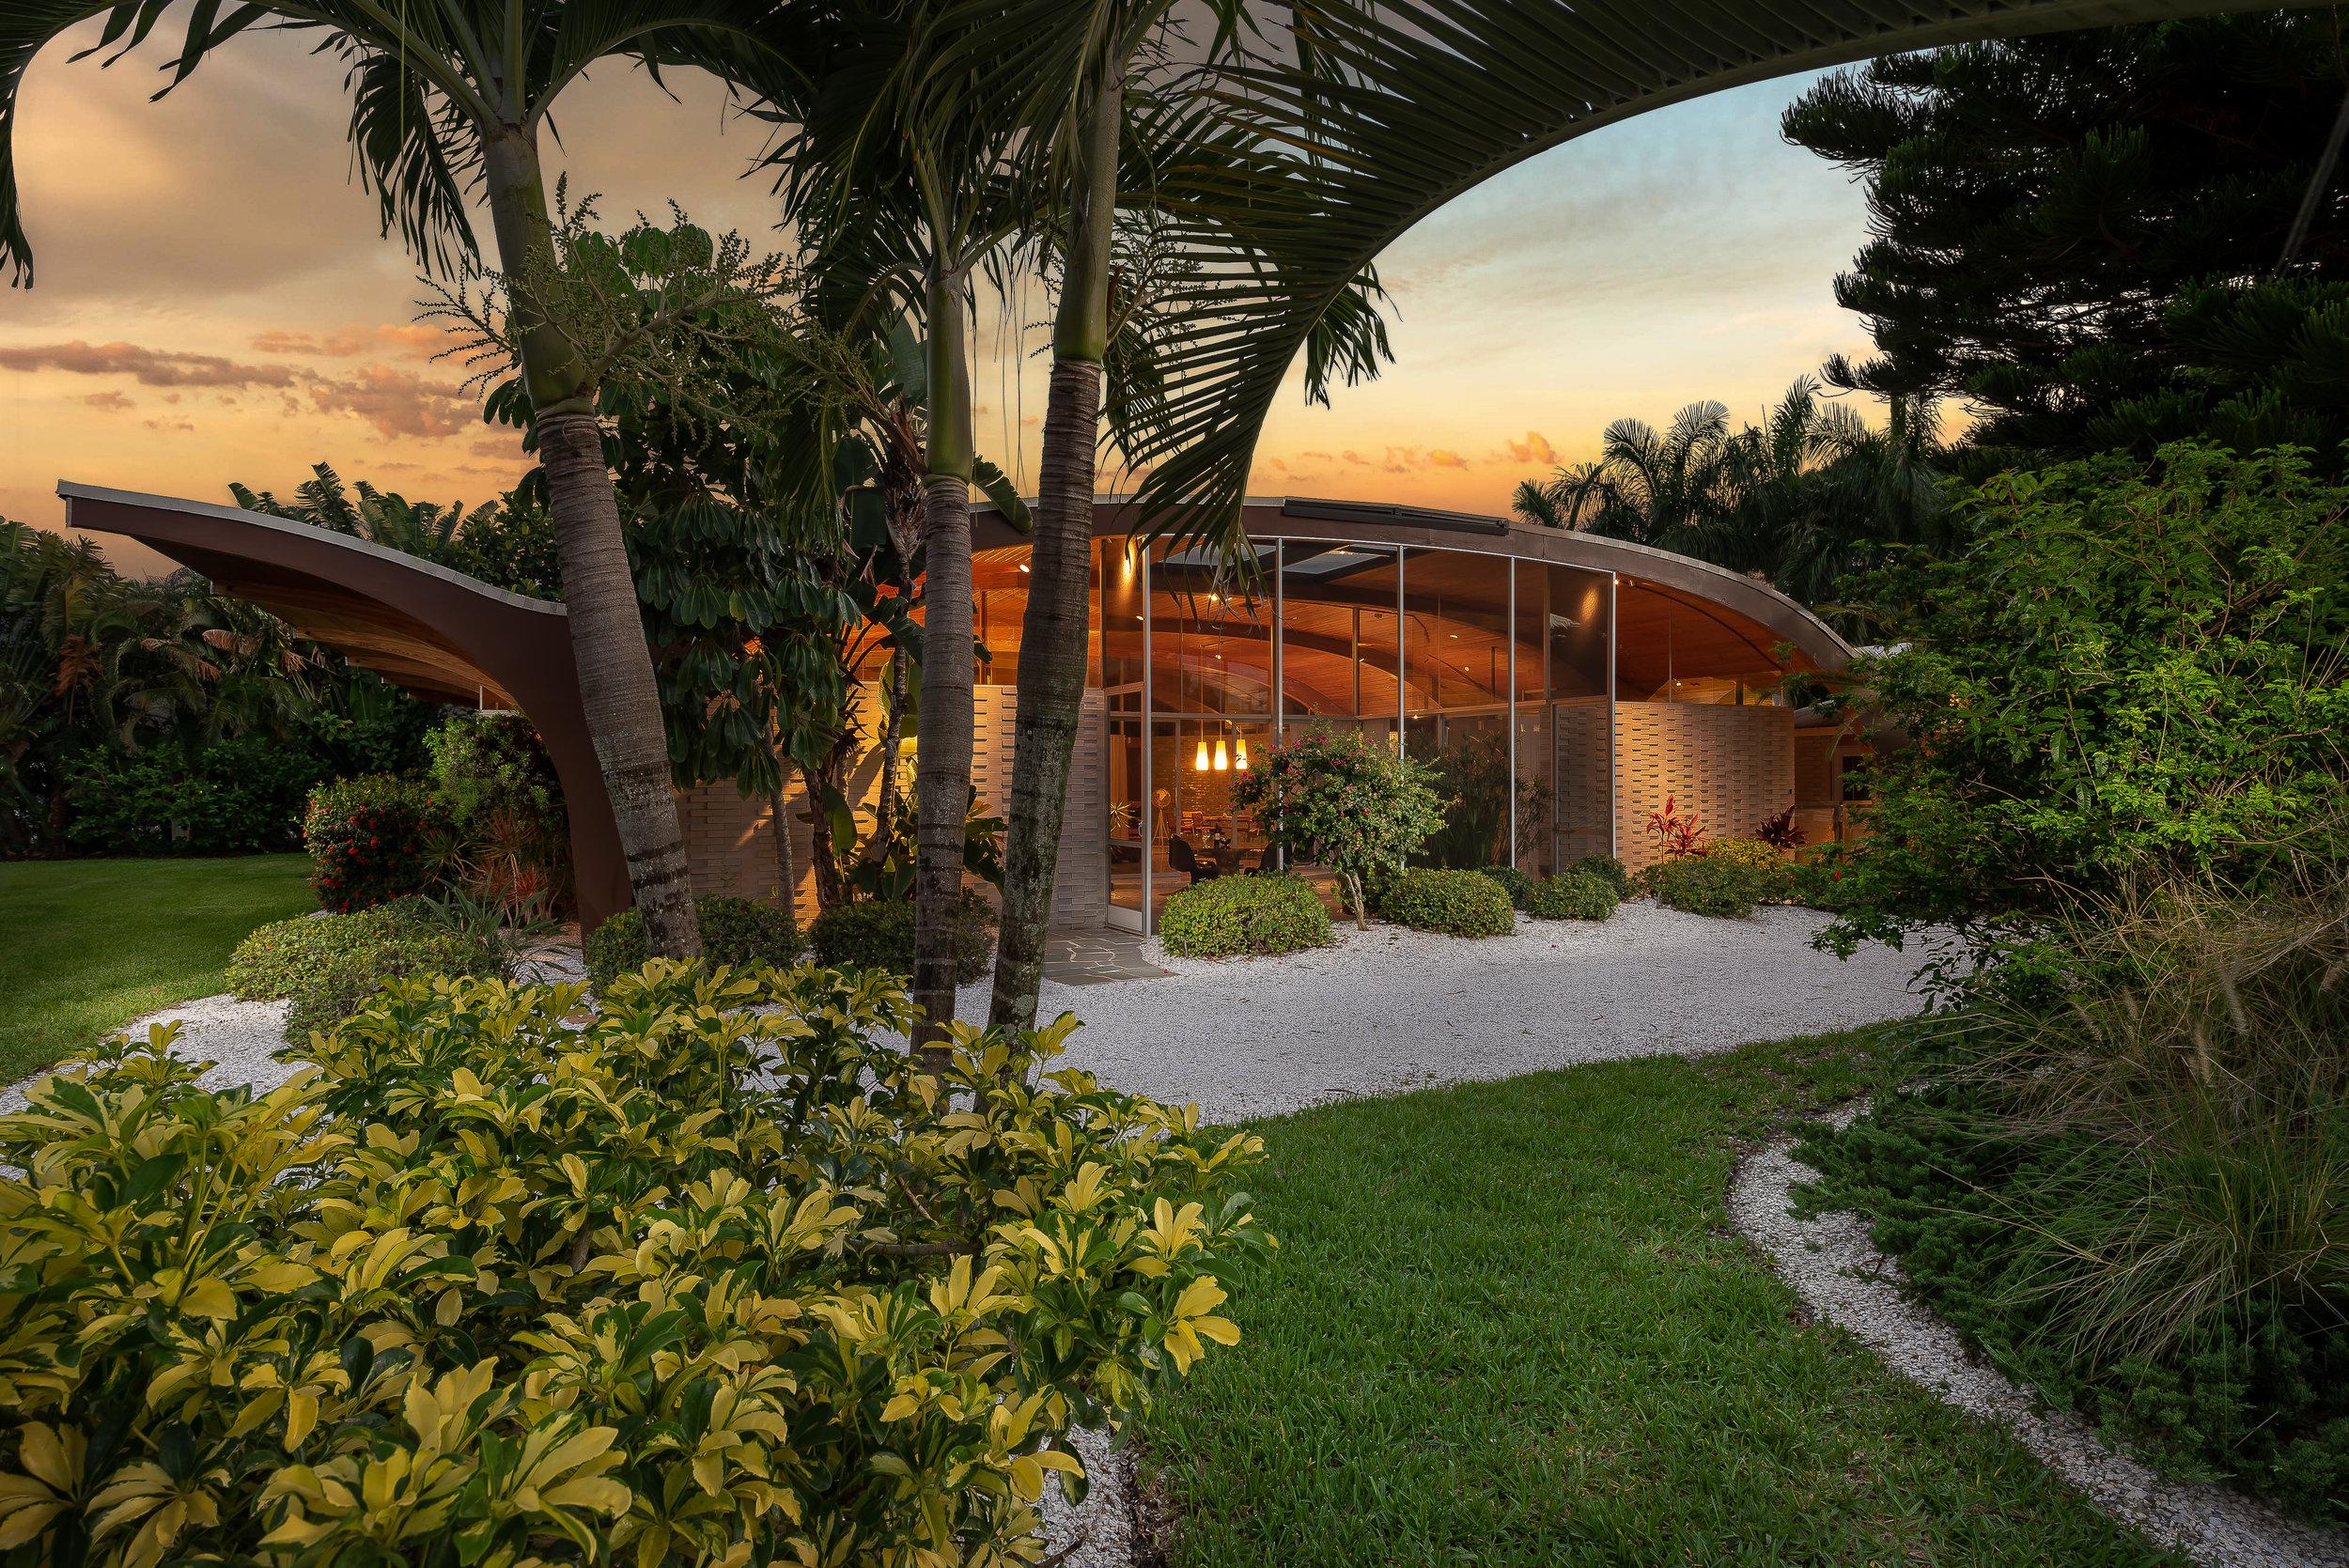 Architecture Photography Miami-4380.jpg